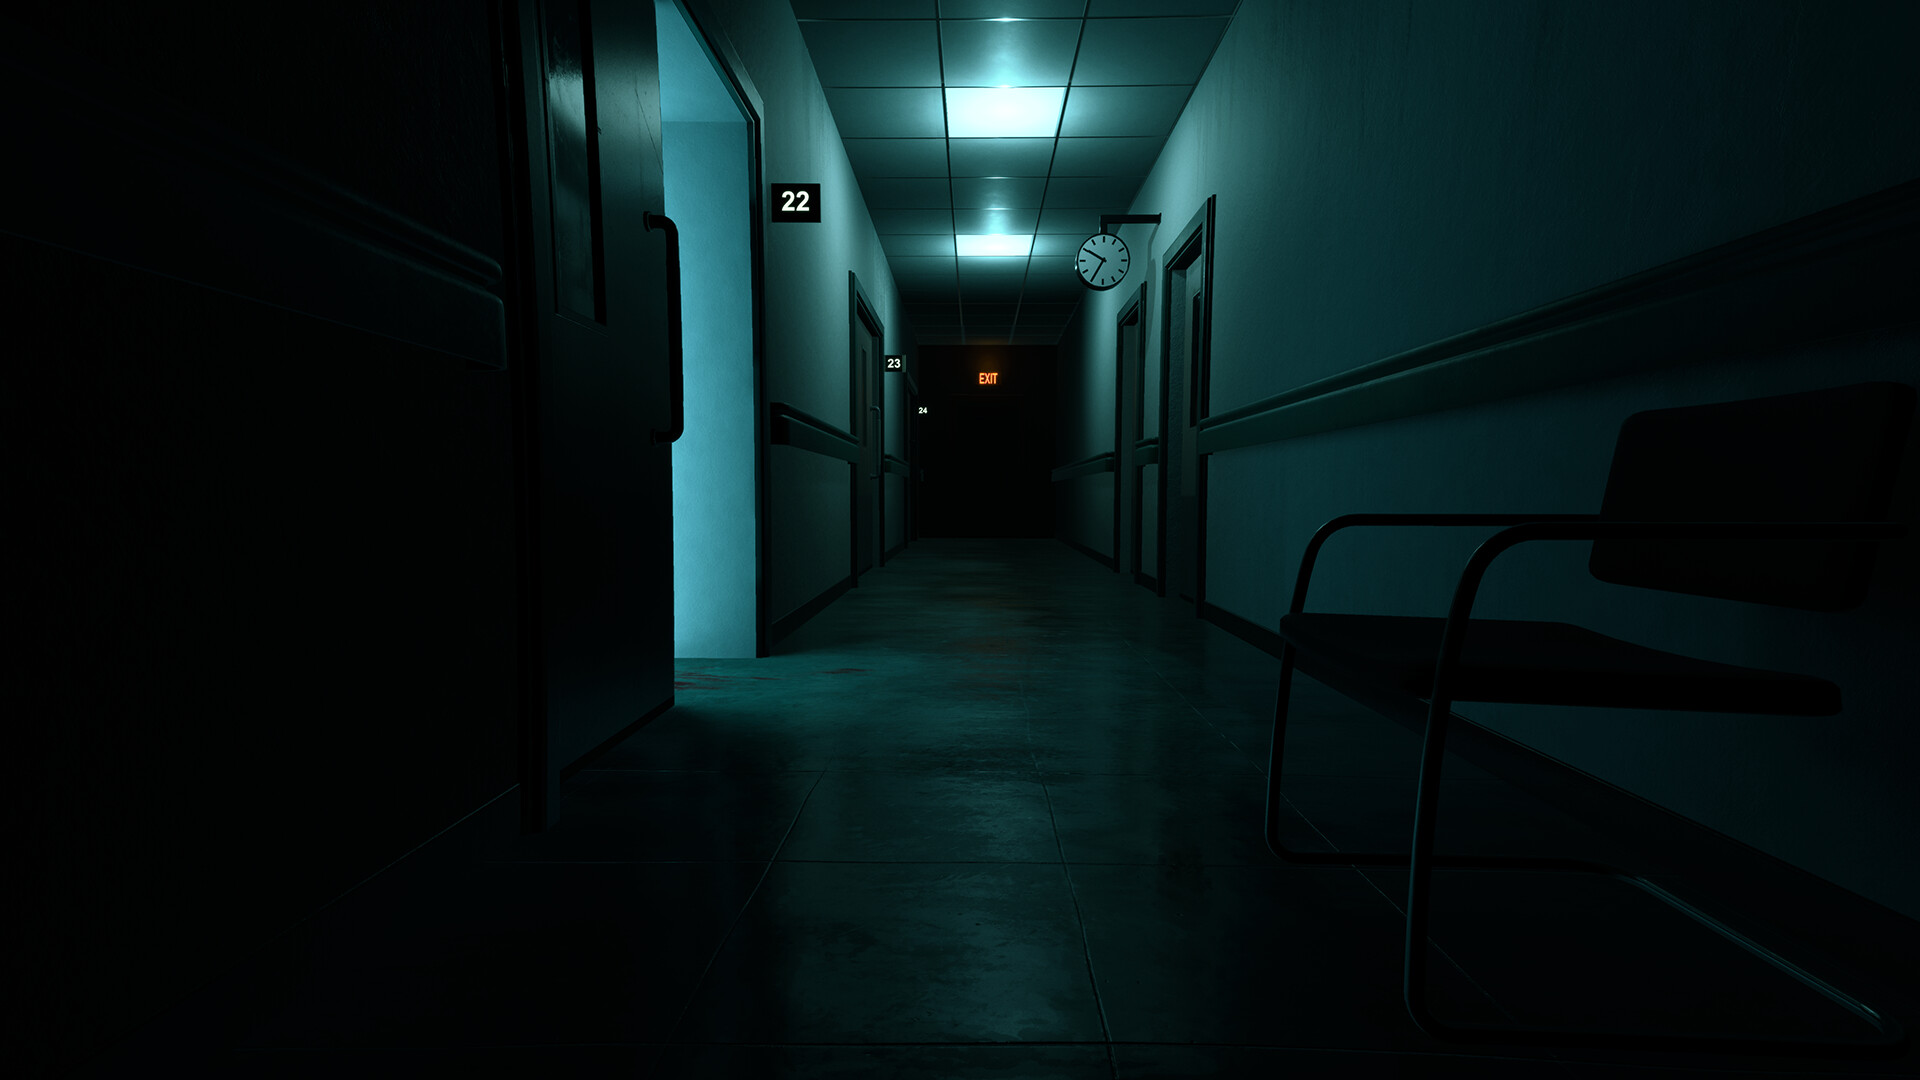 ArtStation - Hospital Corridor - HD Render Pipeline (Unity), Astrid